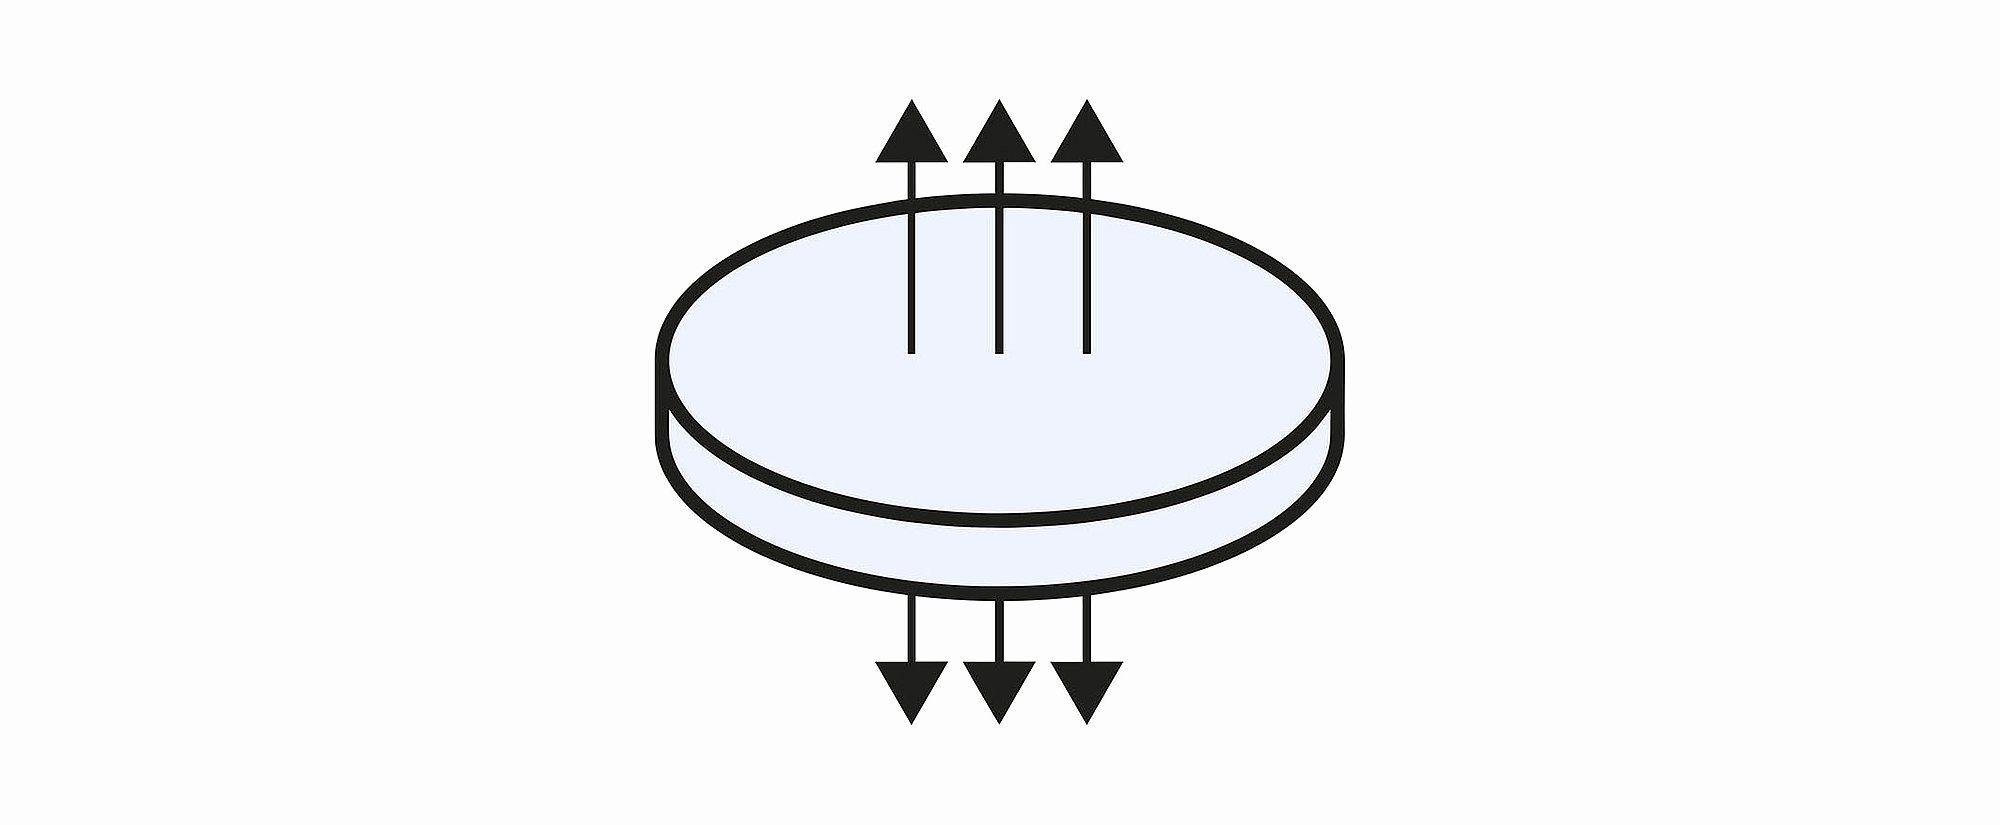 Bendy Caricature Drawing Book Inspirational Piezoelectric Discs